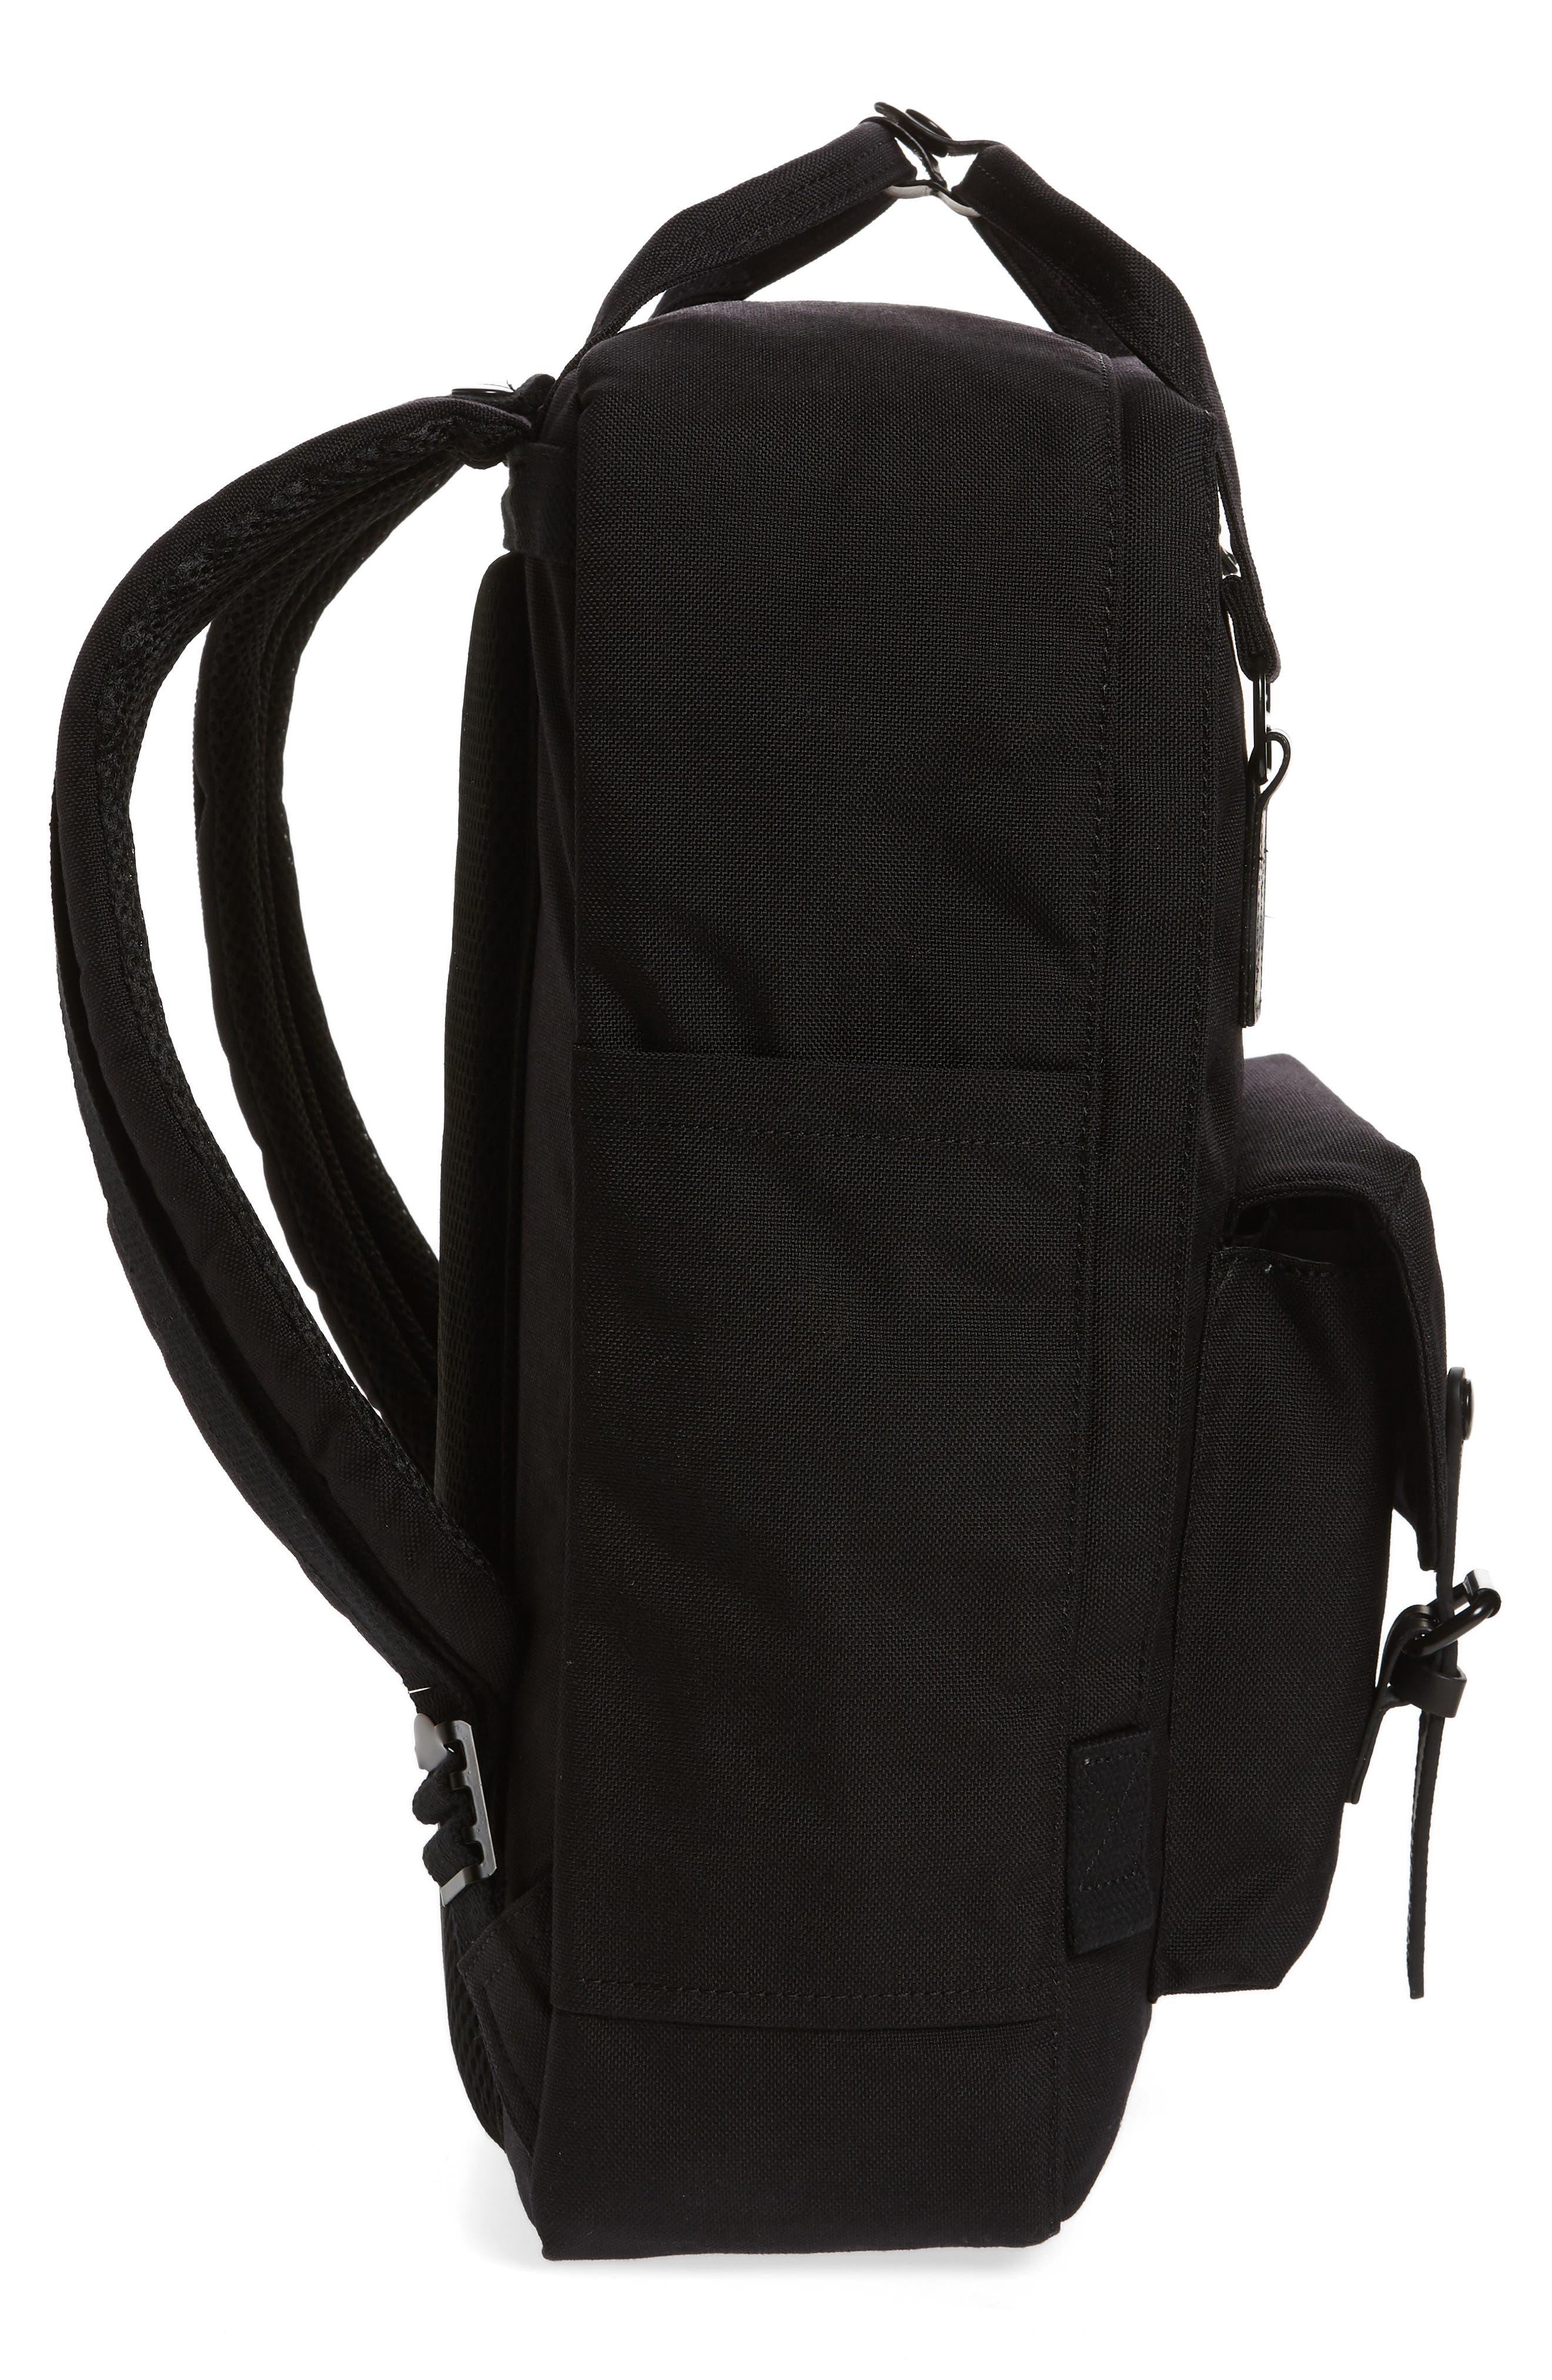 Macaroon Large Cordura<sup>®</sup> Black Series Water Repellent Backpack,                             Alternate thumbnail 5, color,                             Black